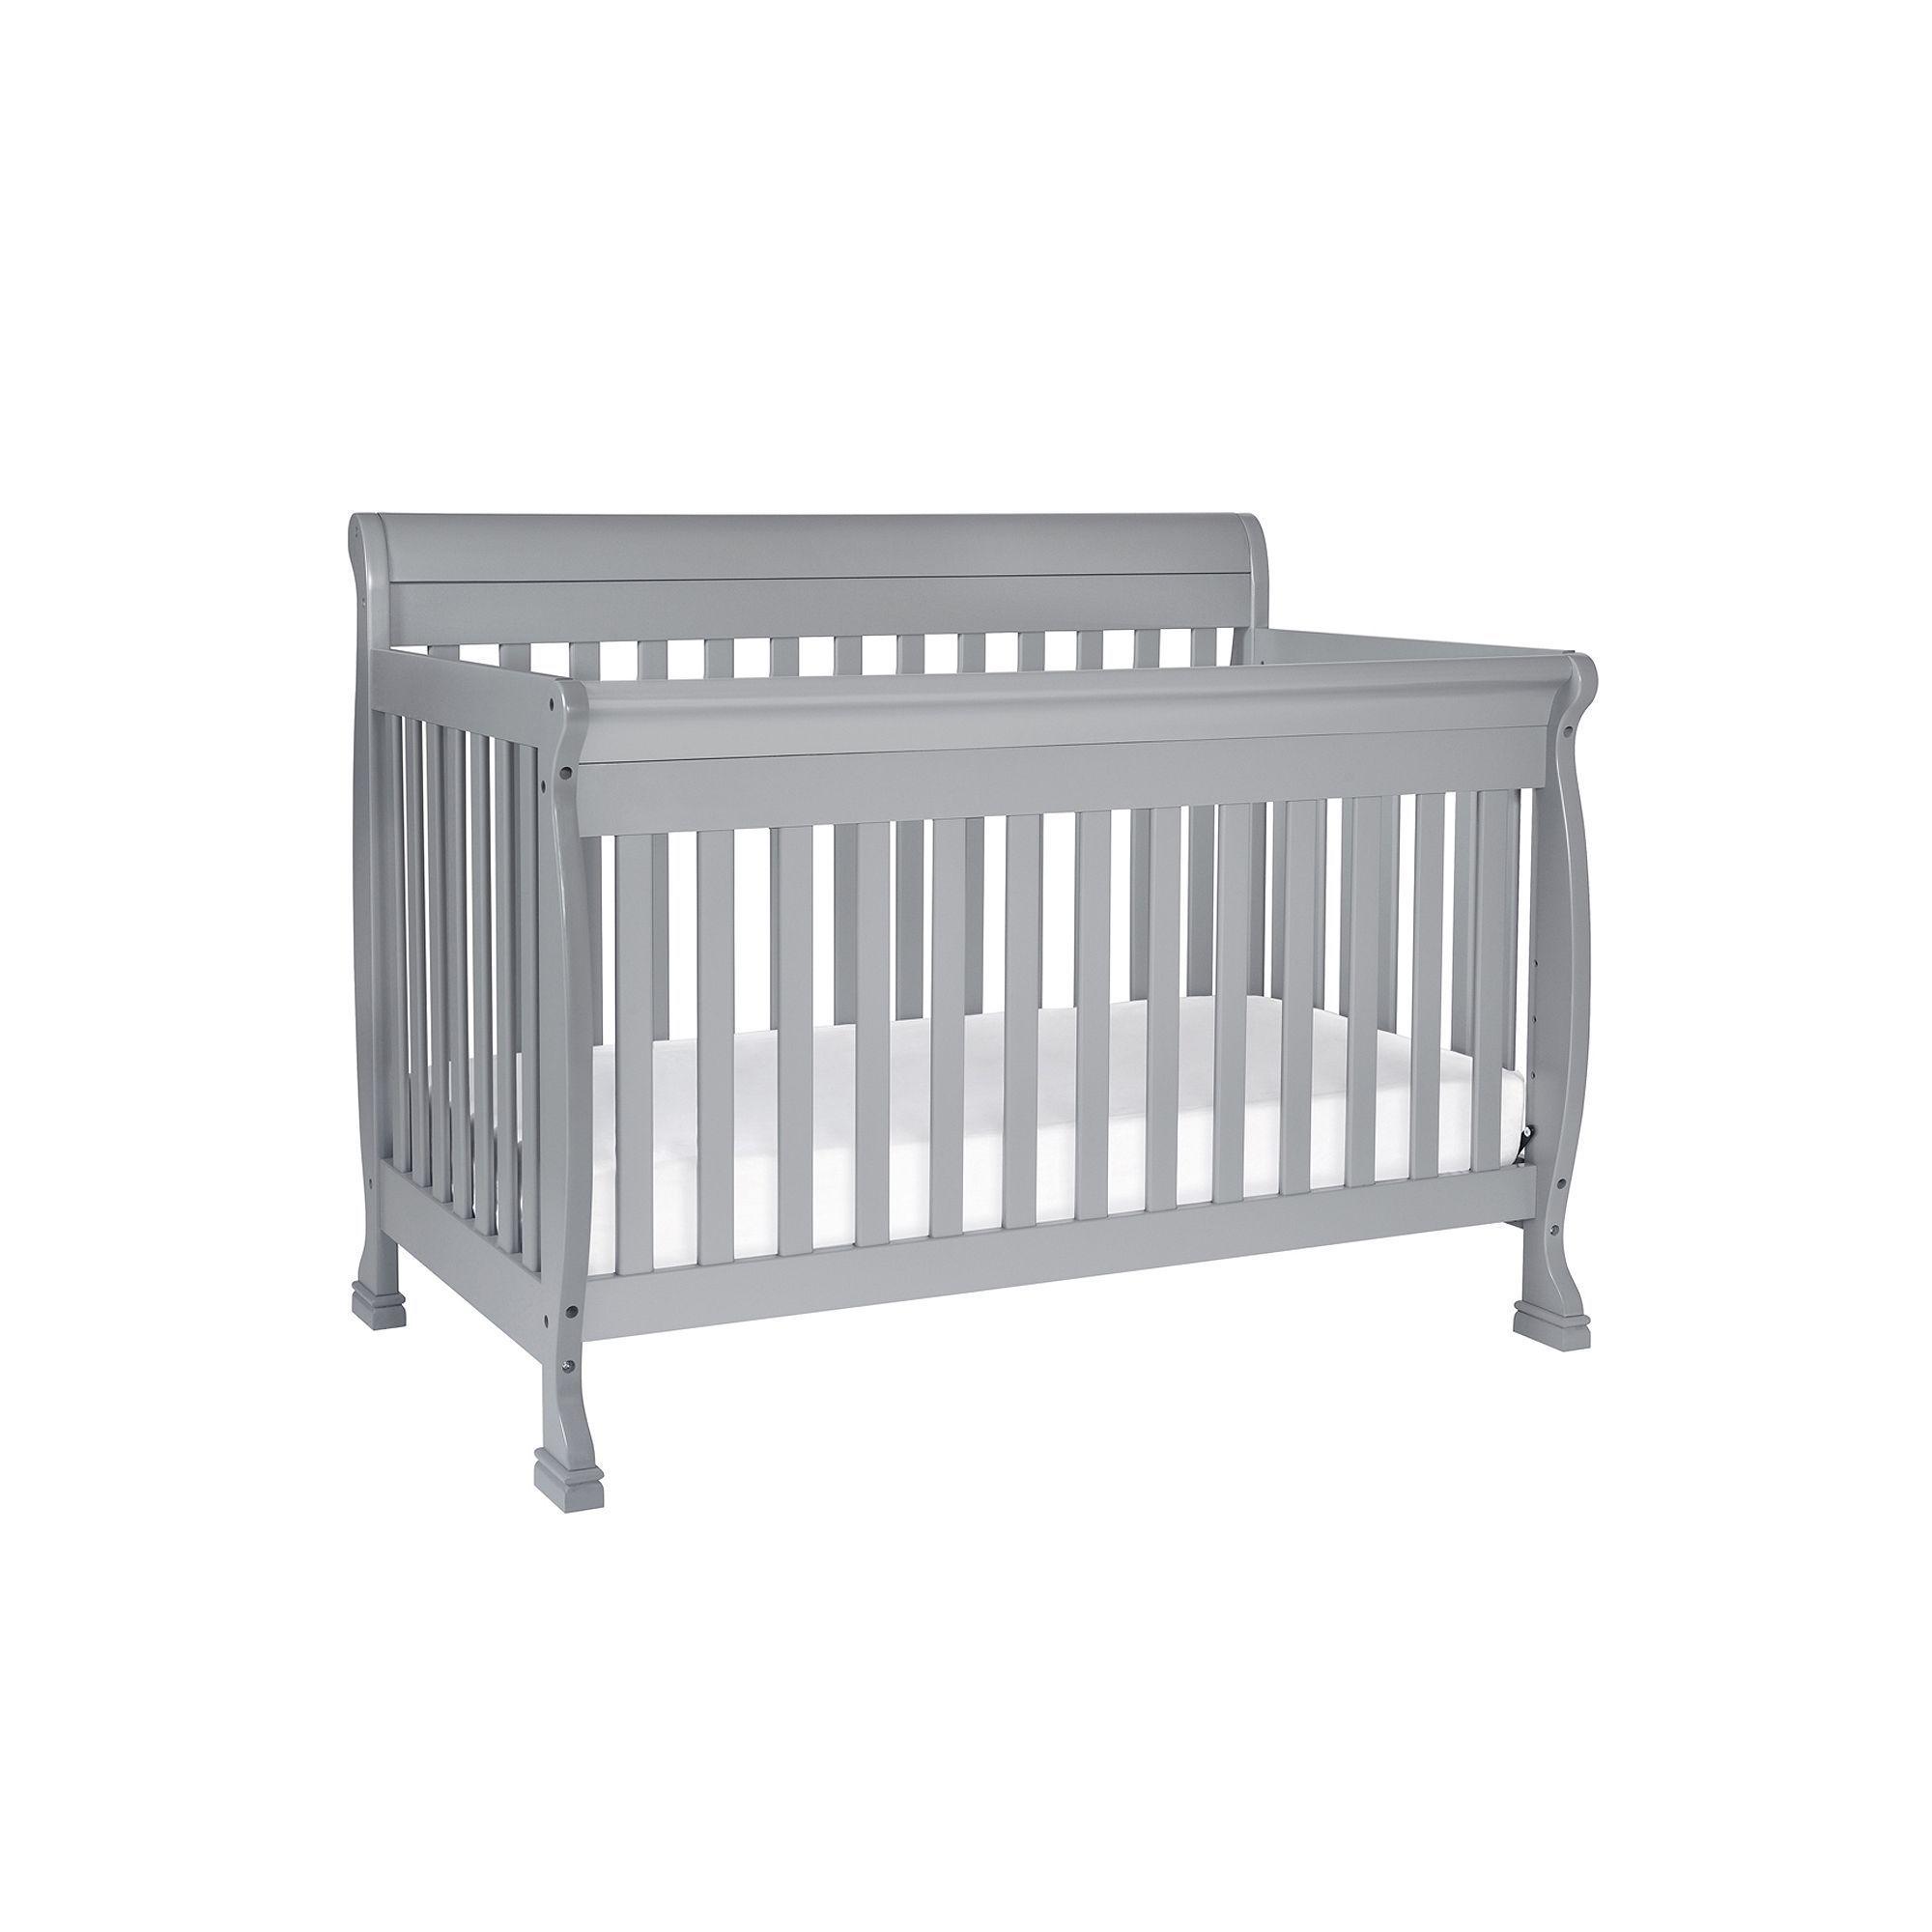 Davinci Kalani 4 In 1 Convertible Crib Convertible Crib 4 In 1 Crib Cribs